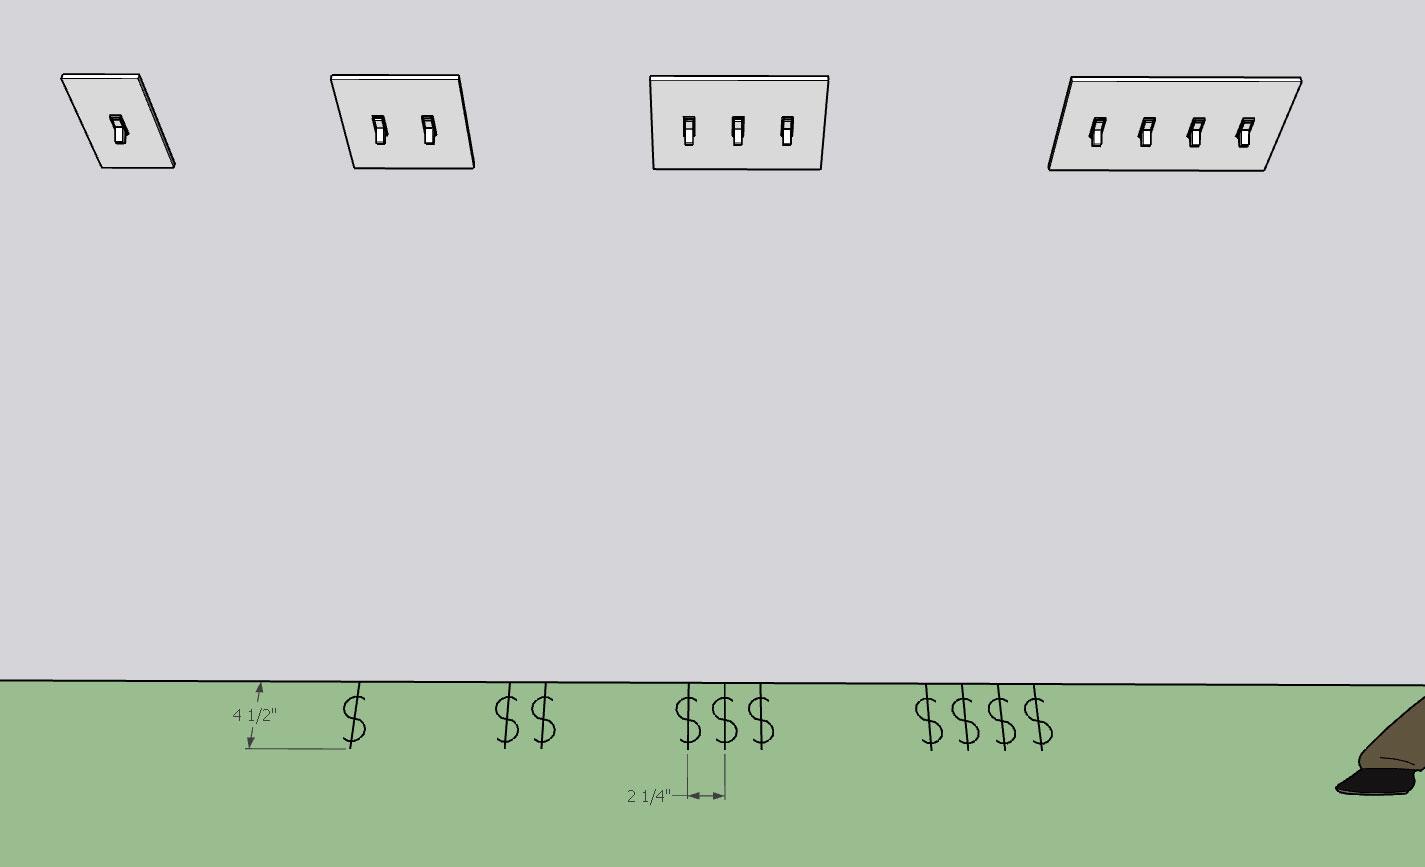 hight resolution of electrical su2 800 jpg1425 867